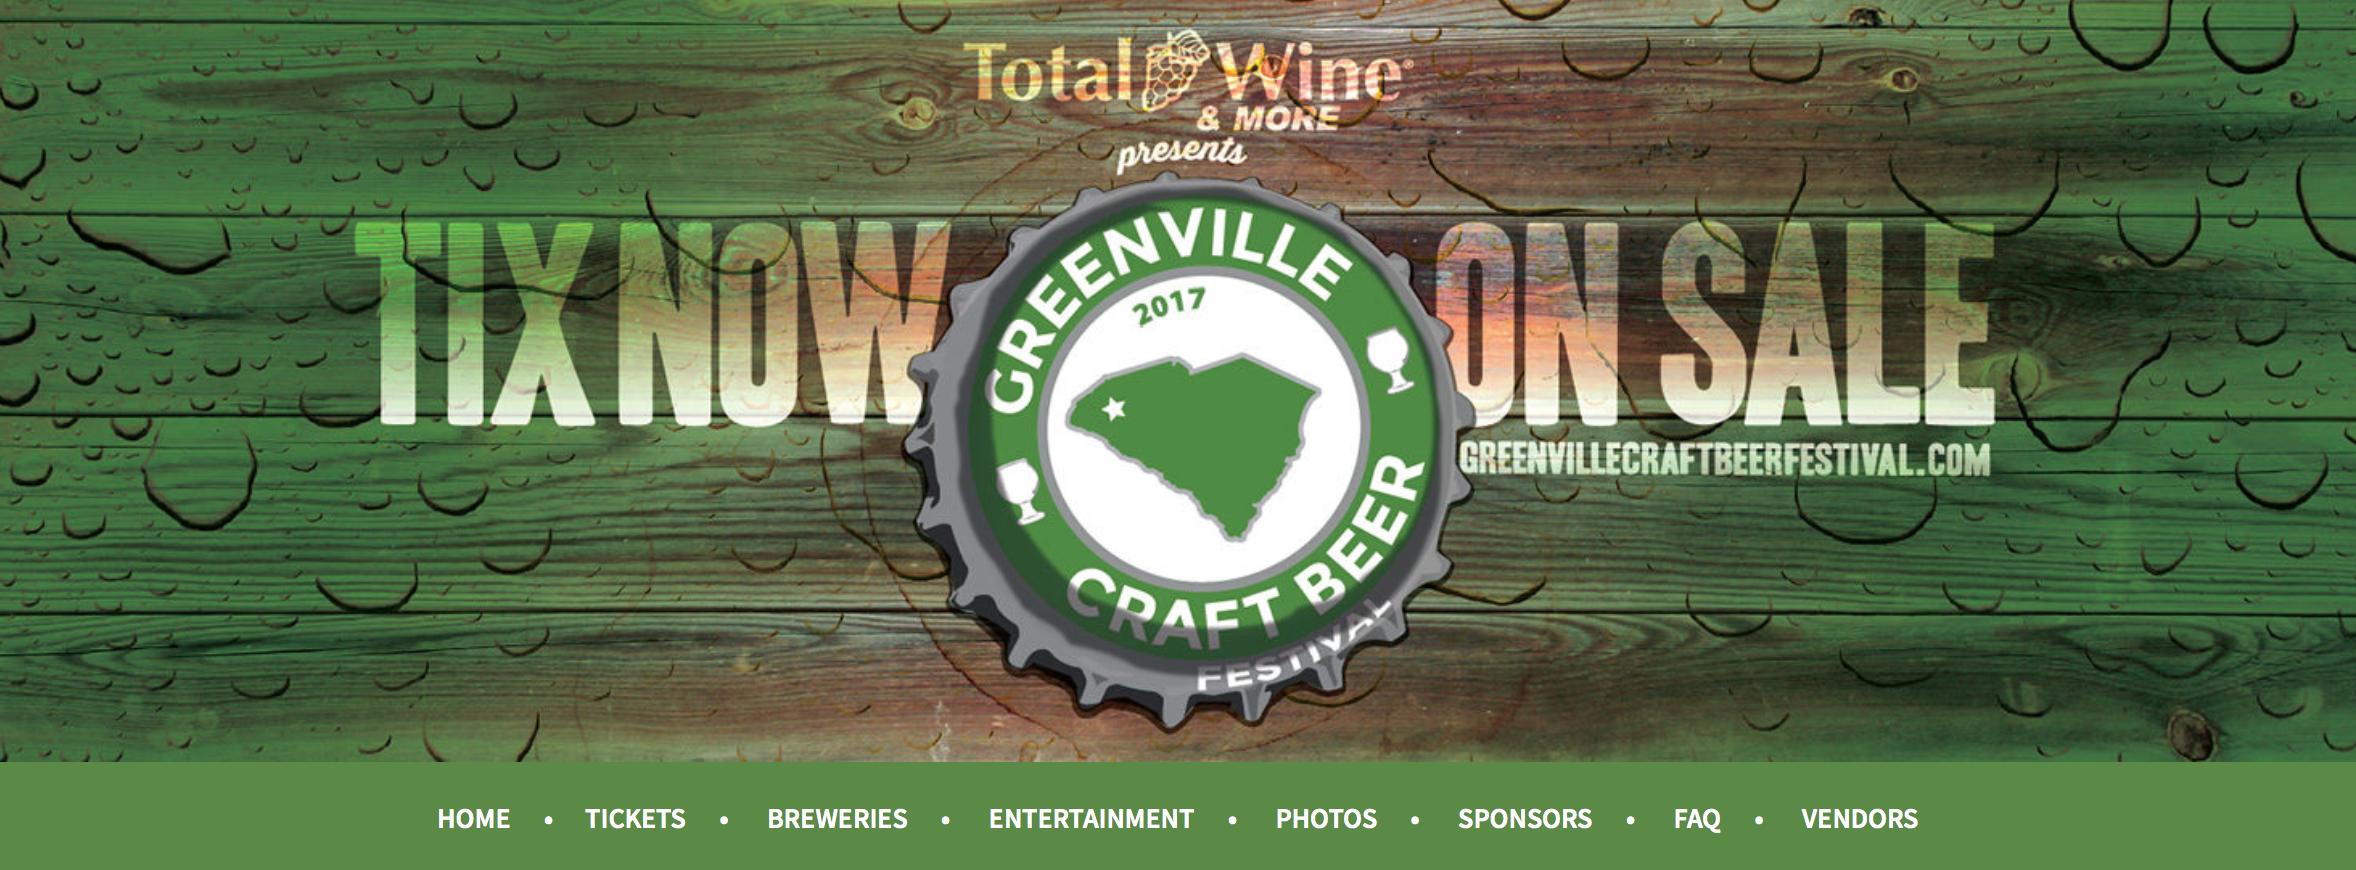 Greenville Craft Beer Festival.png